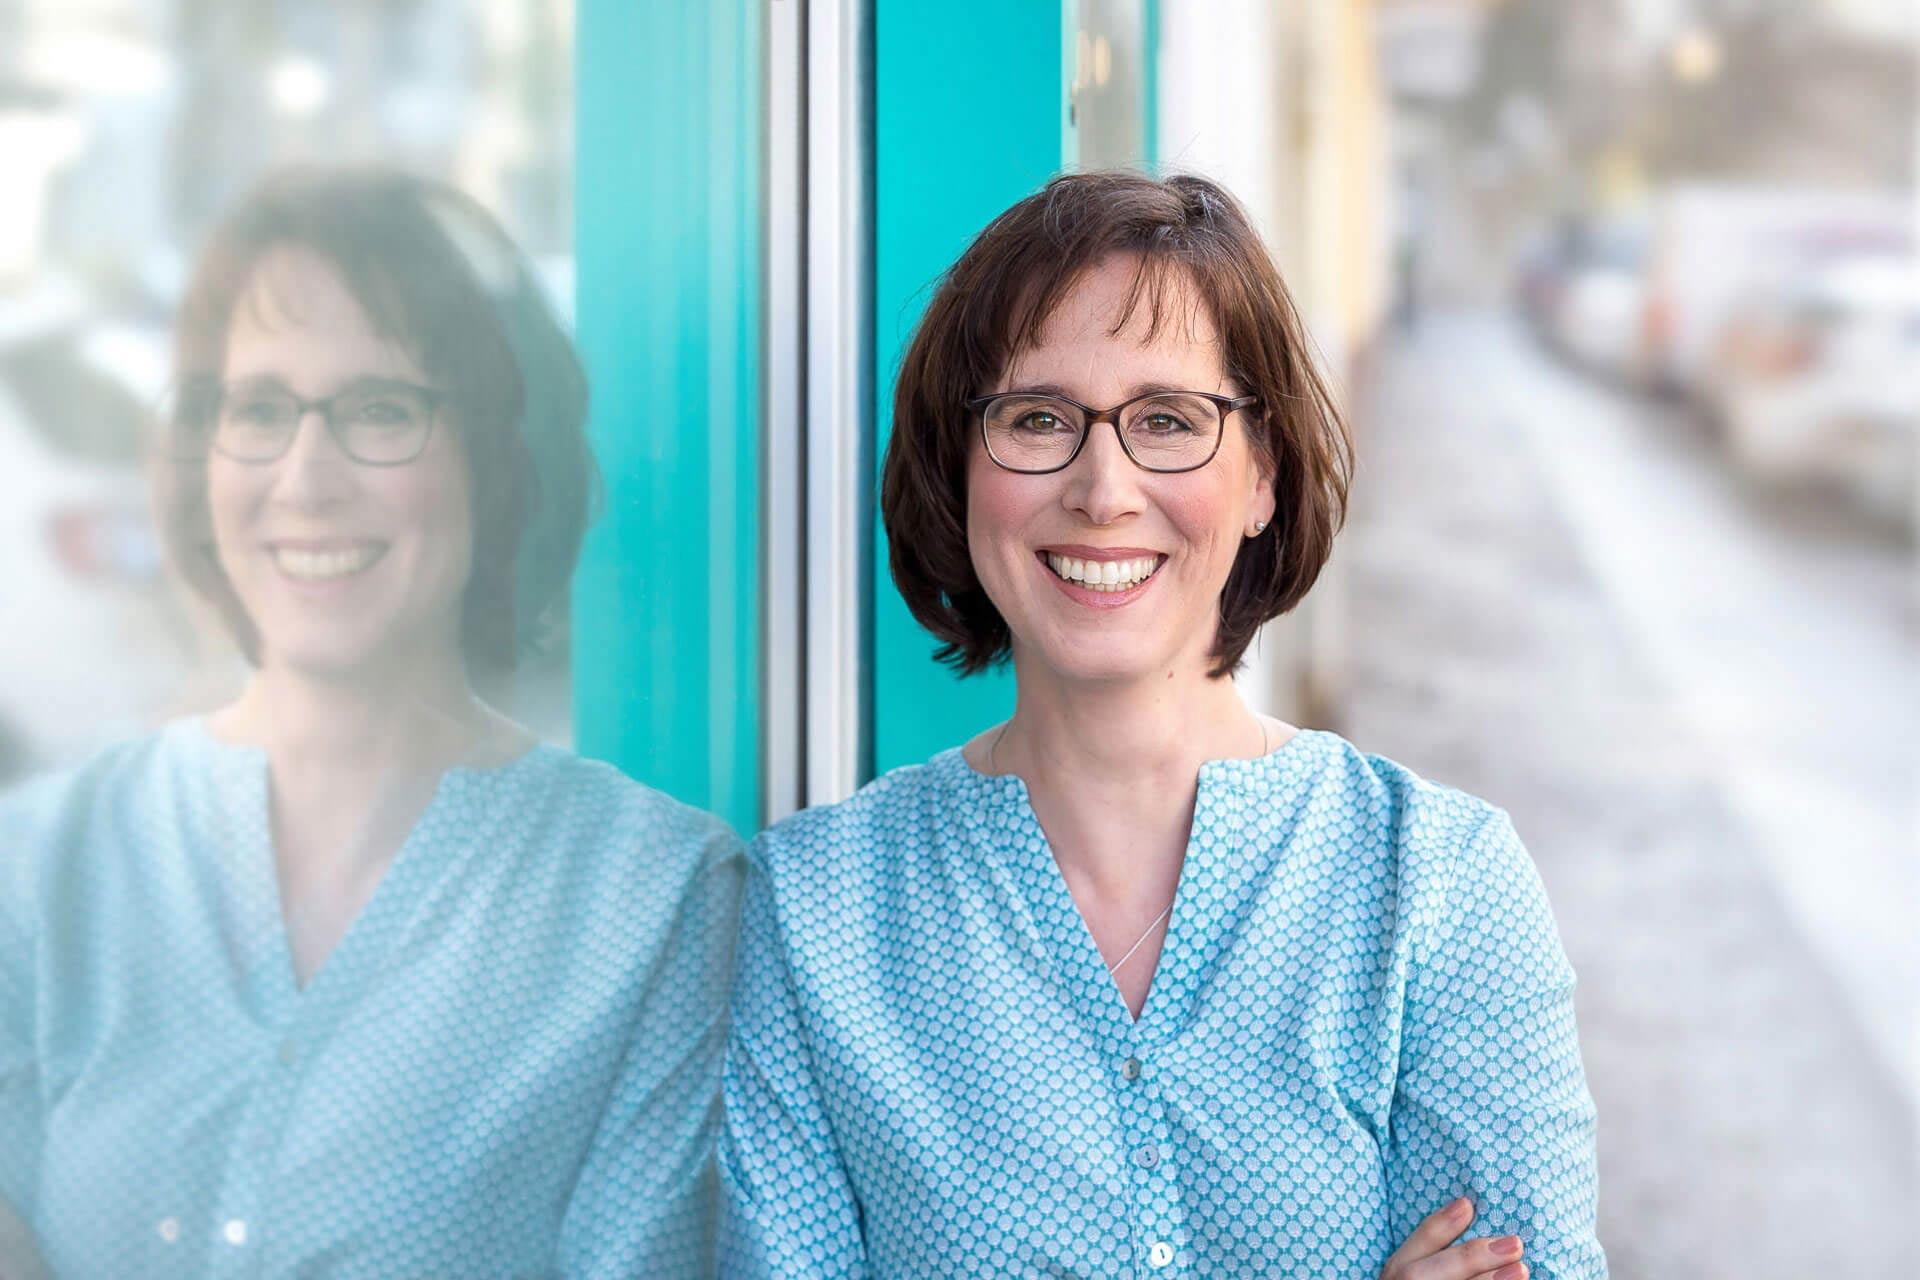 personal-branding-fotos-berlin-unternehmerin-businessfrau-grafikerin